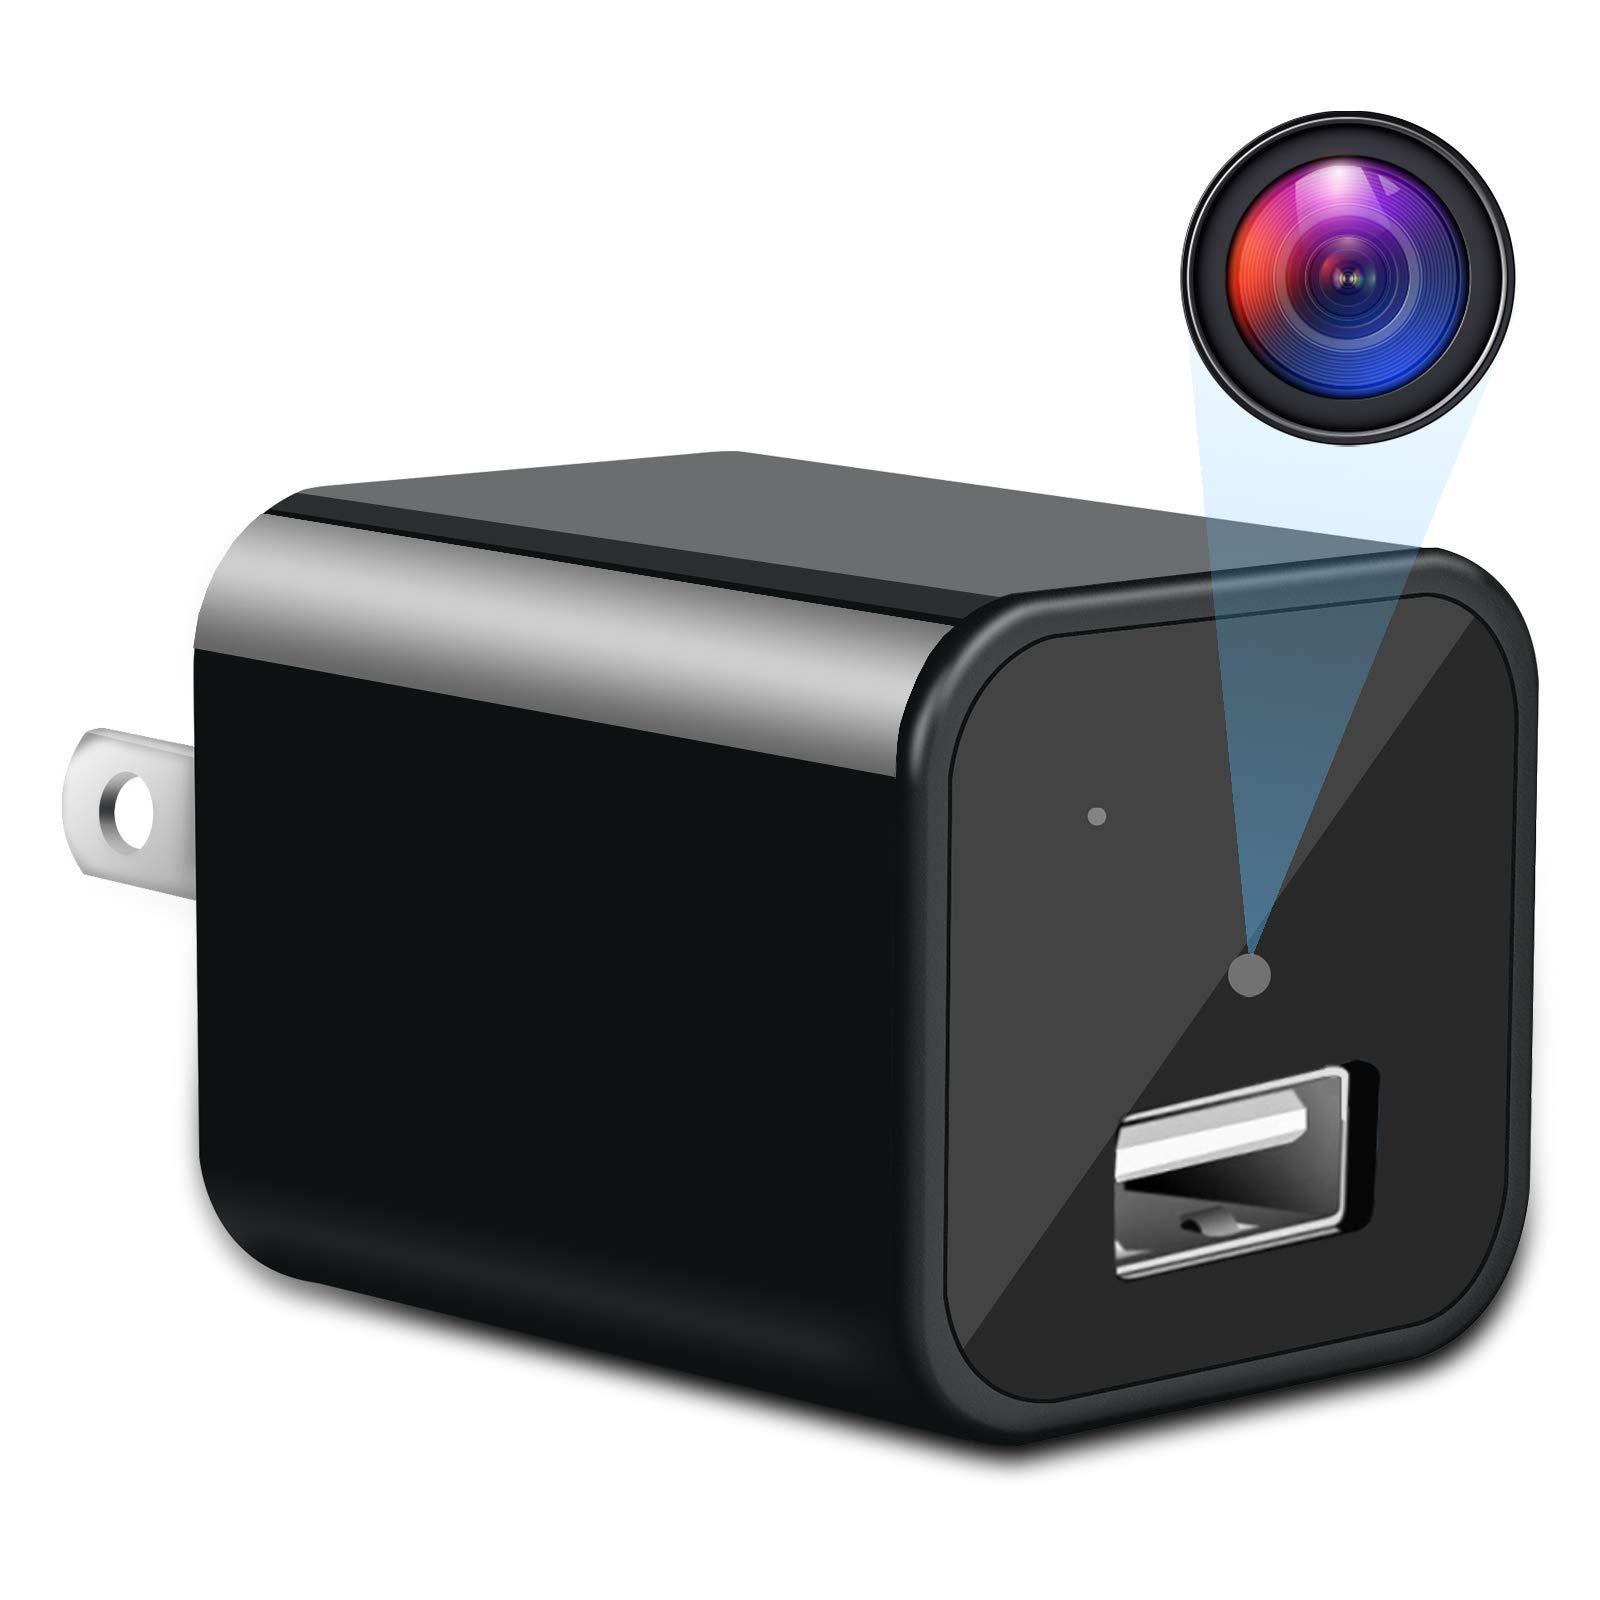 Hidden Camera Charger - Spy Camera - Non WiFi Camera 1080P HD Nanny Cam/Security Camera USB Charger Camera Indoor Motion Activated Surveillance Camera